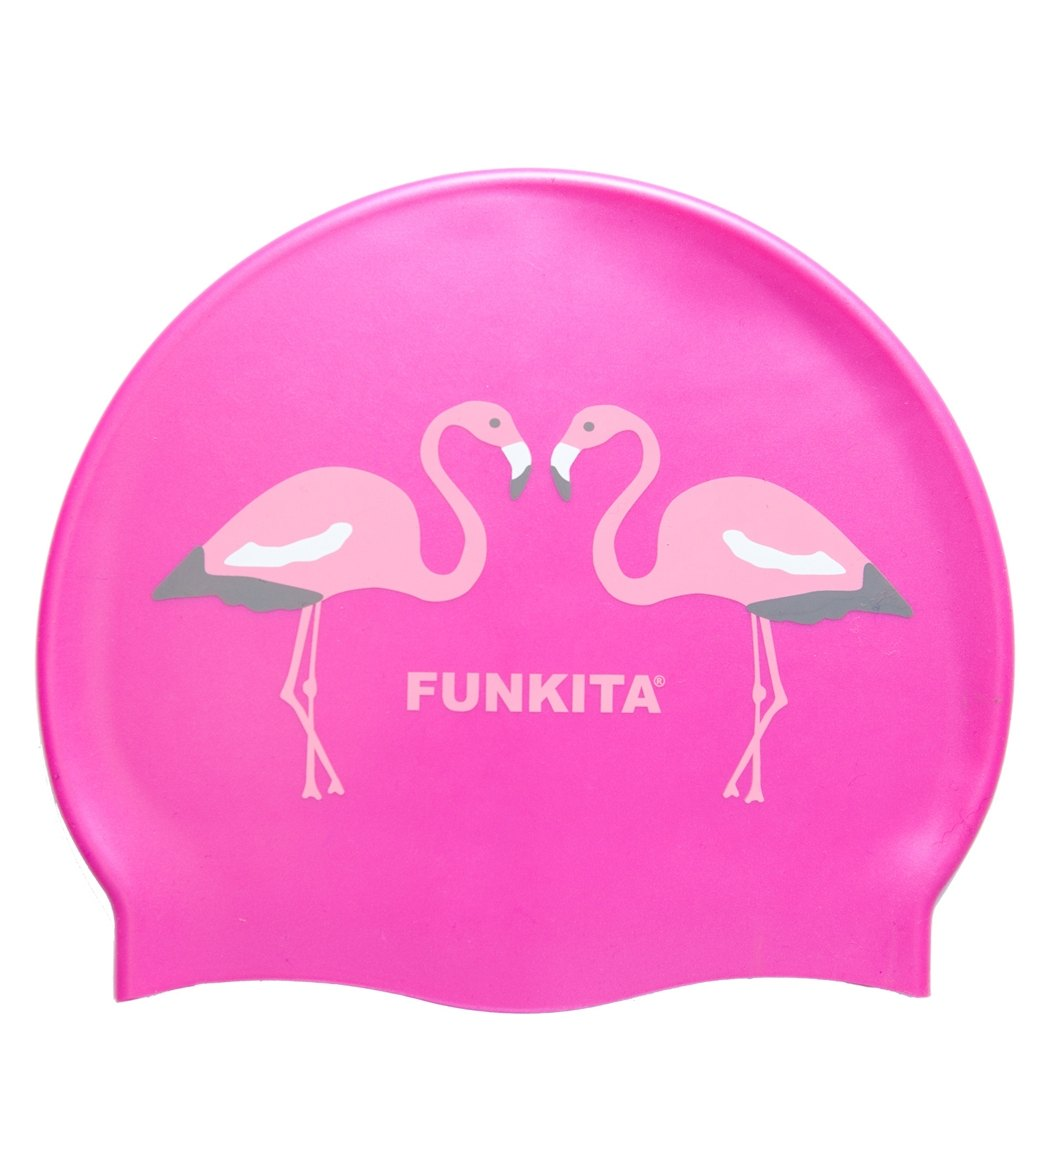 Funkita Flaming Go Go Silicone Swim Cap At Swimoutlet Com